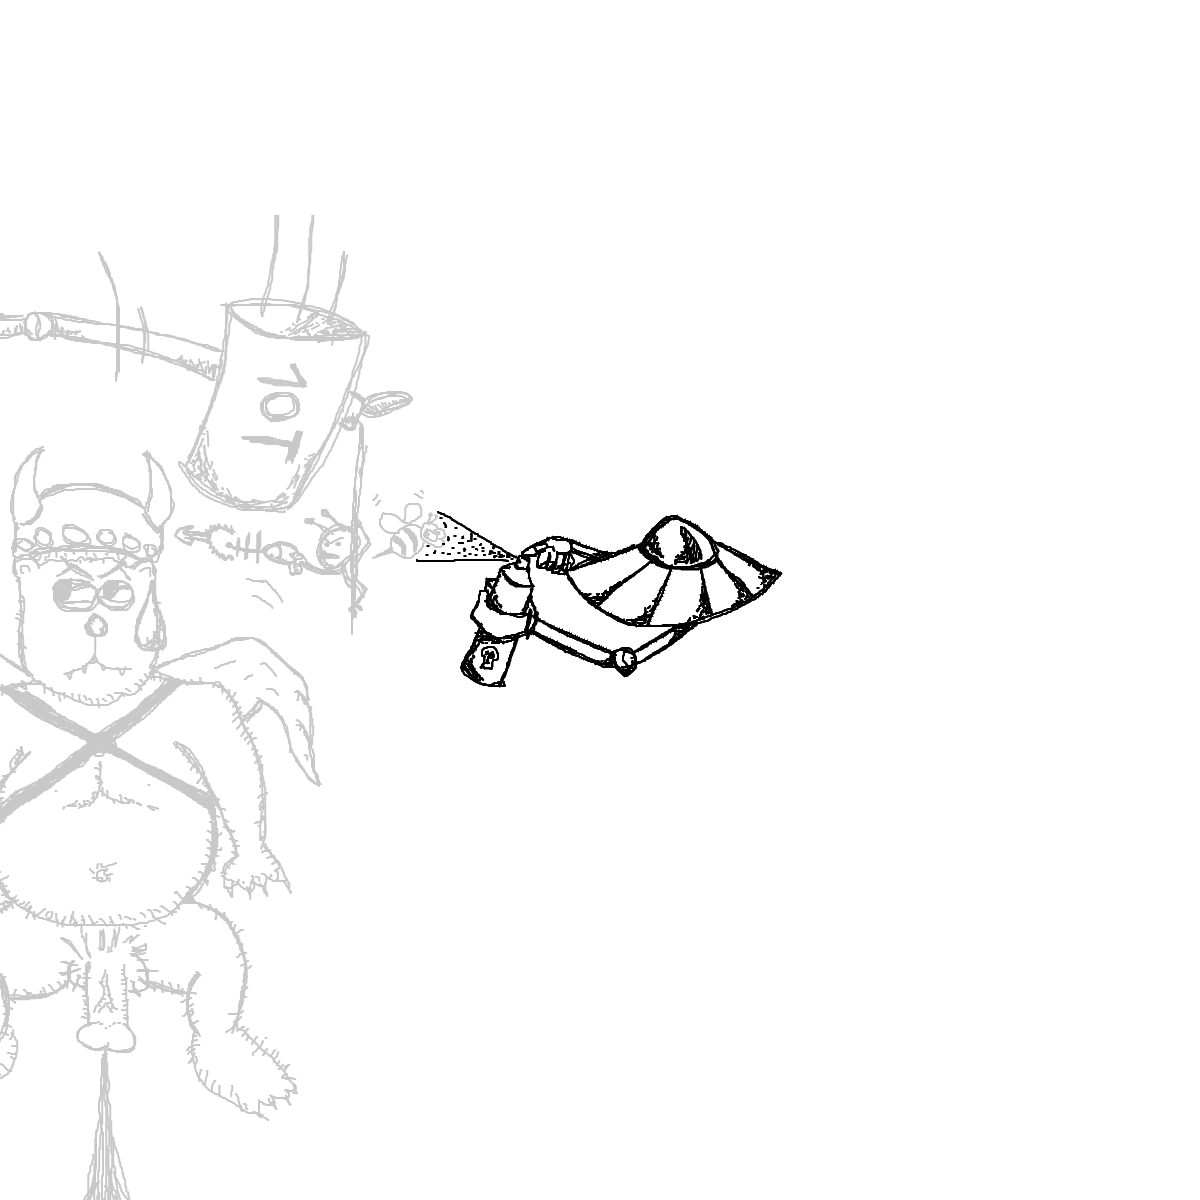 BAAAM drawing#2968 lat:43.3356933593750000lng: -1.9728469848632812